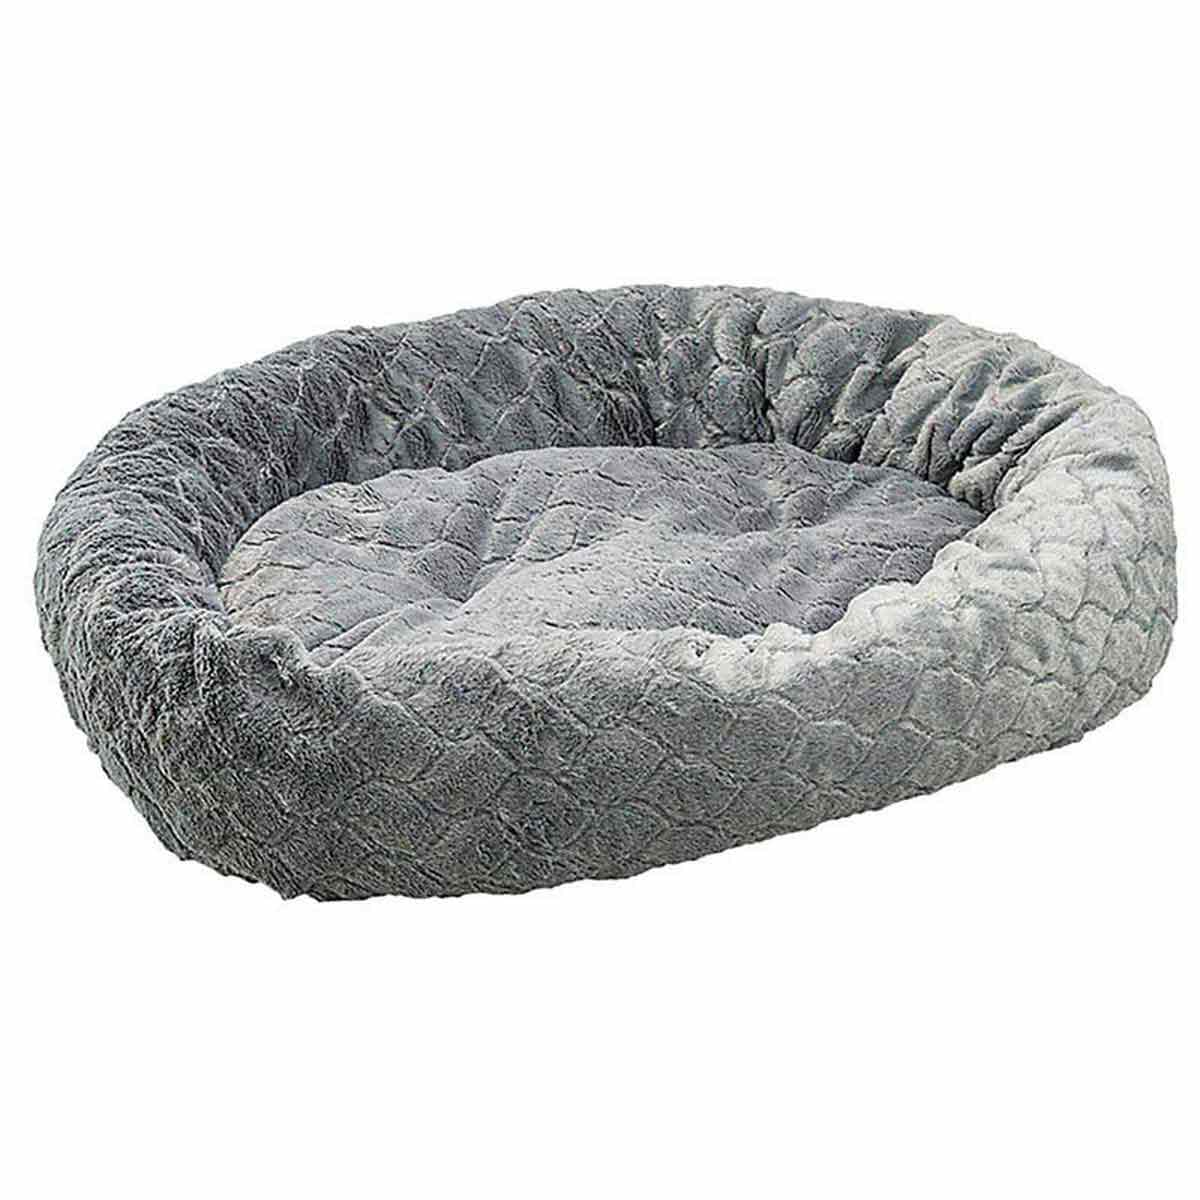 Sleep Zone Dark Grey Diamond Cut Lounger Oval Cuddler Bed for Pets - 31 inch